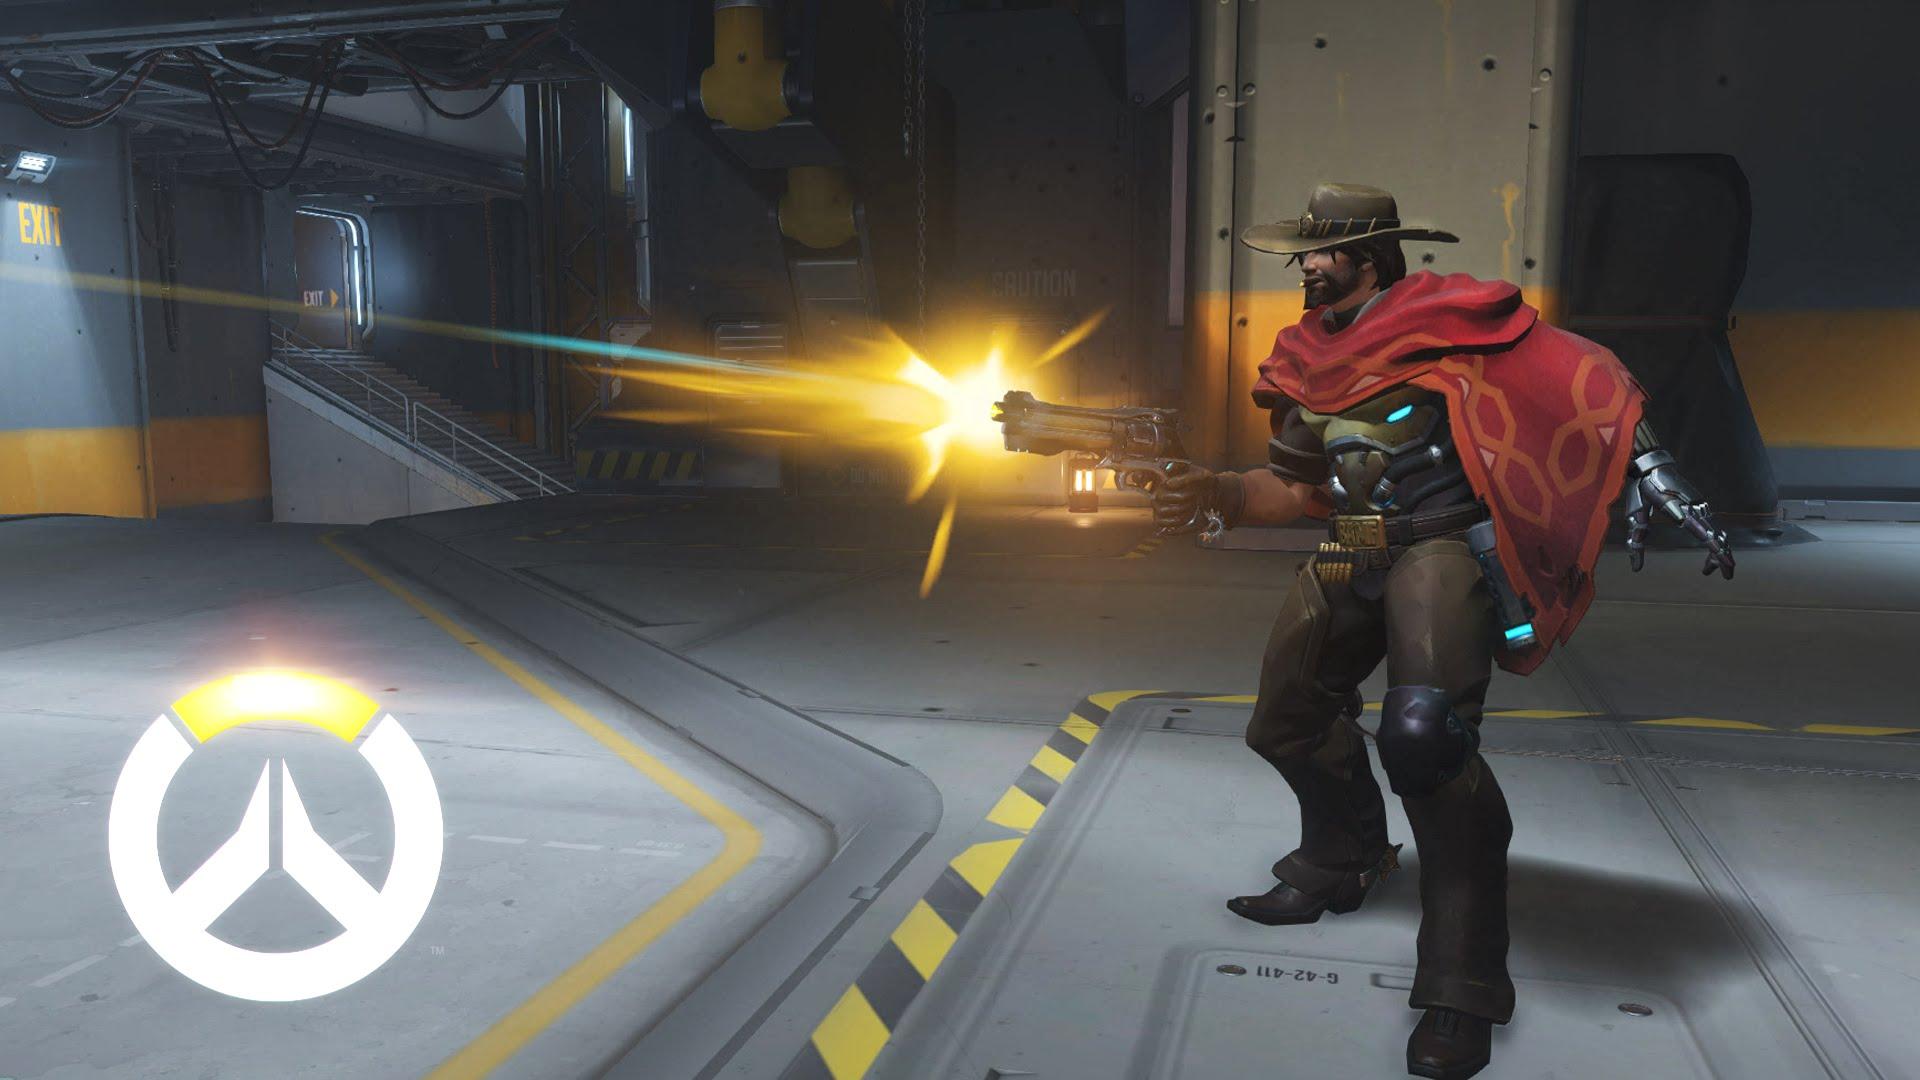 Overwatch: смотрите, как эти Маккри играют во Фроггер на Оазисе